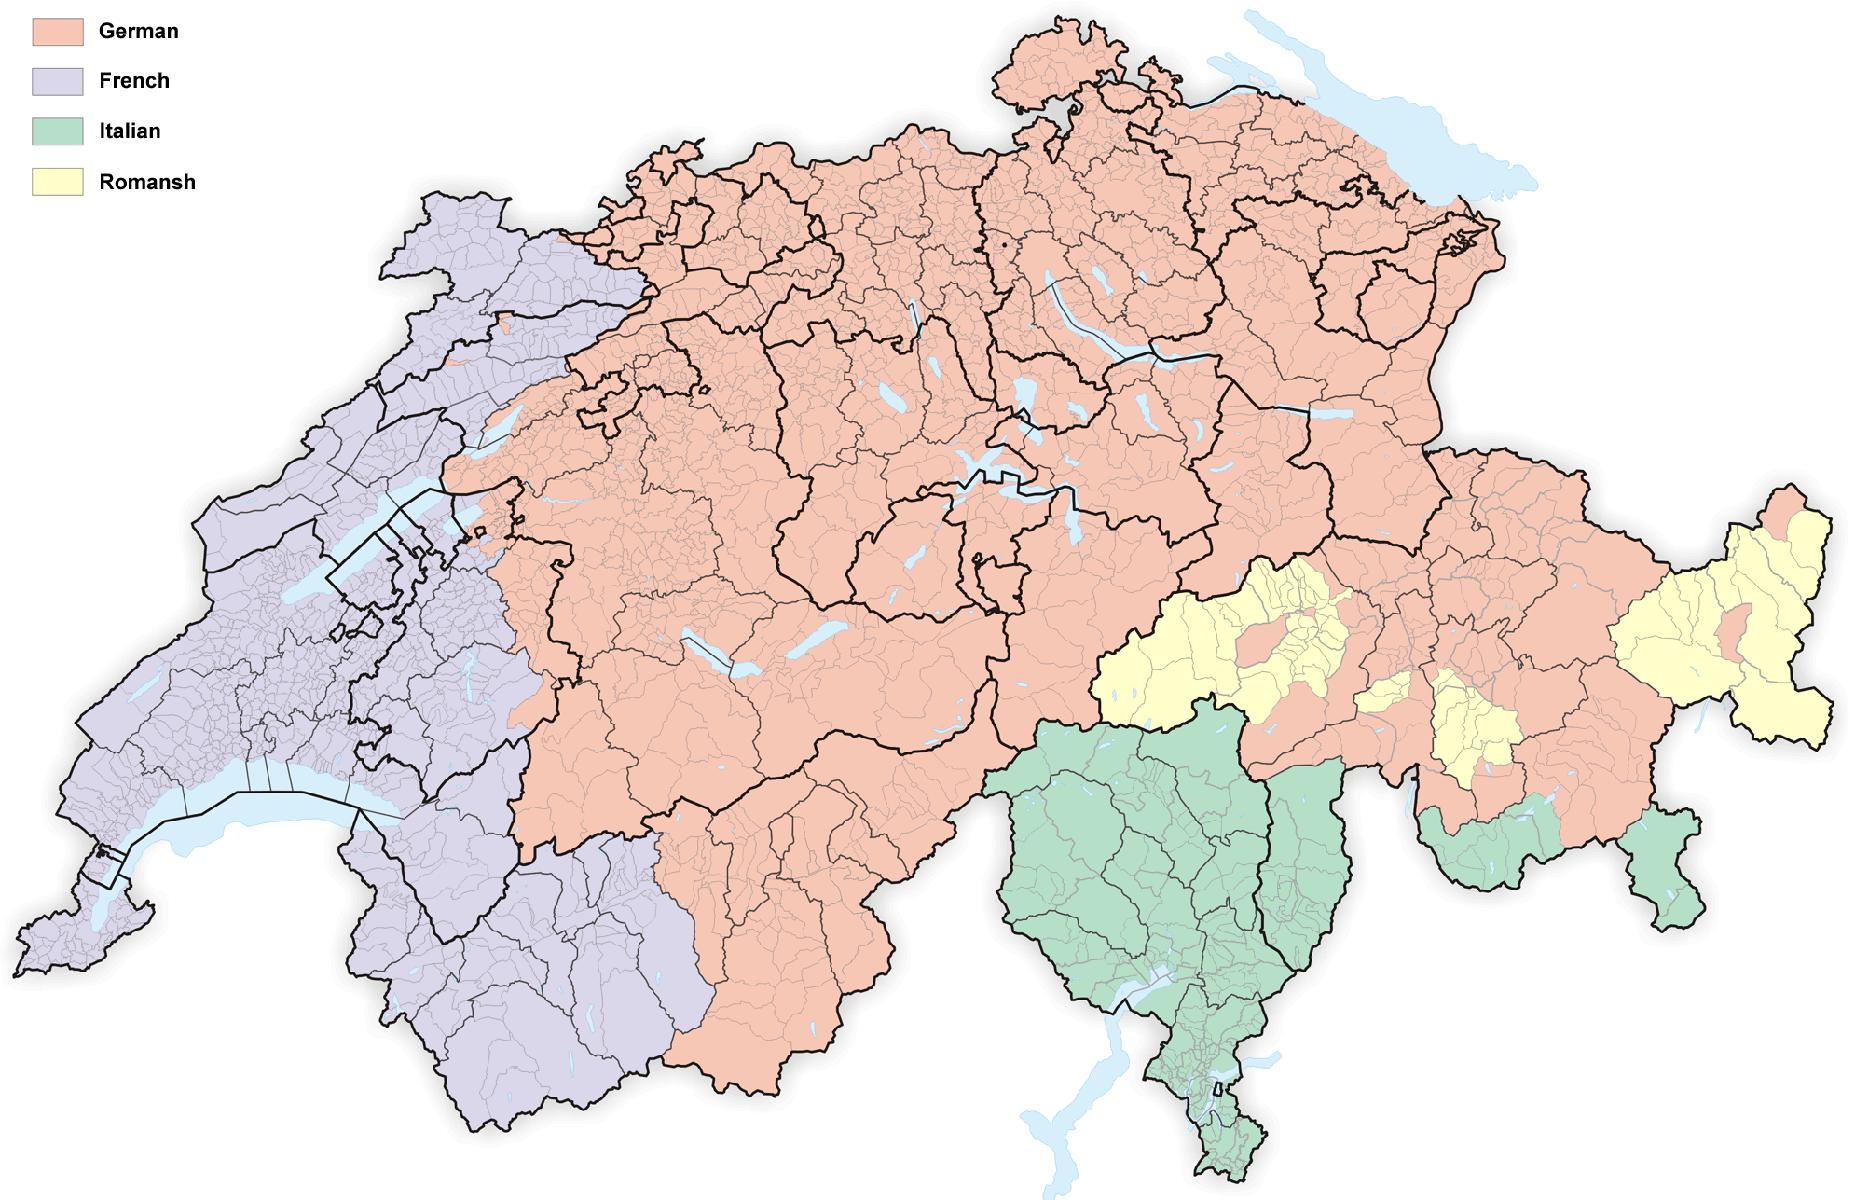 Map of language distribution in Switzerland (Image: Tschubby/Wikimedia)